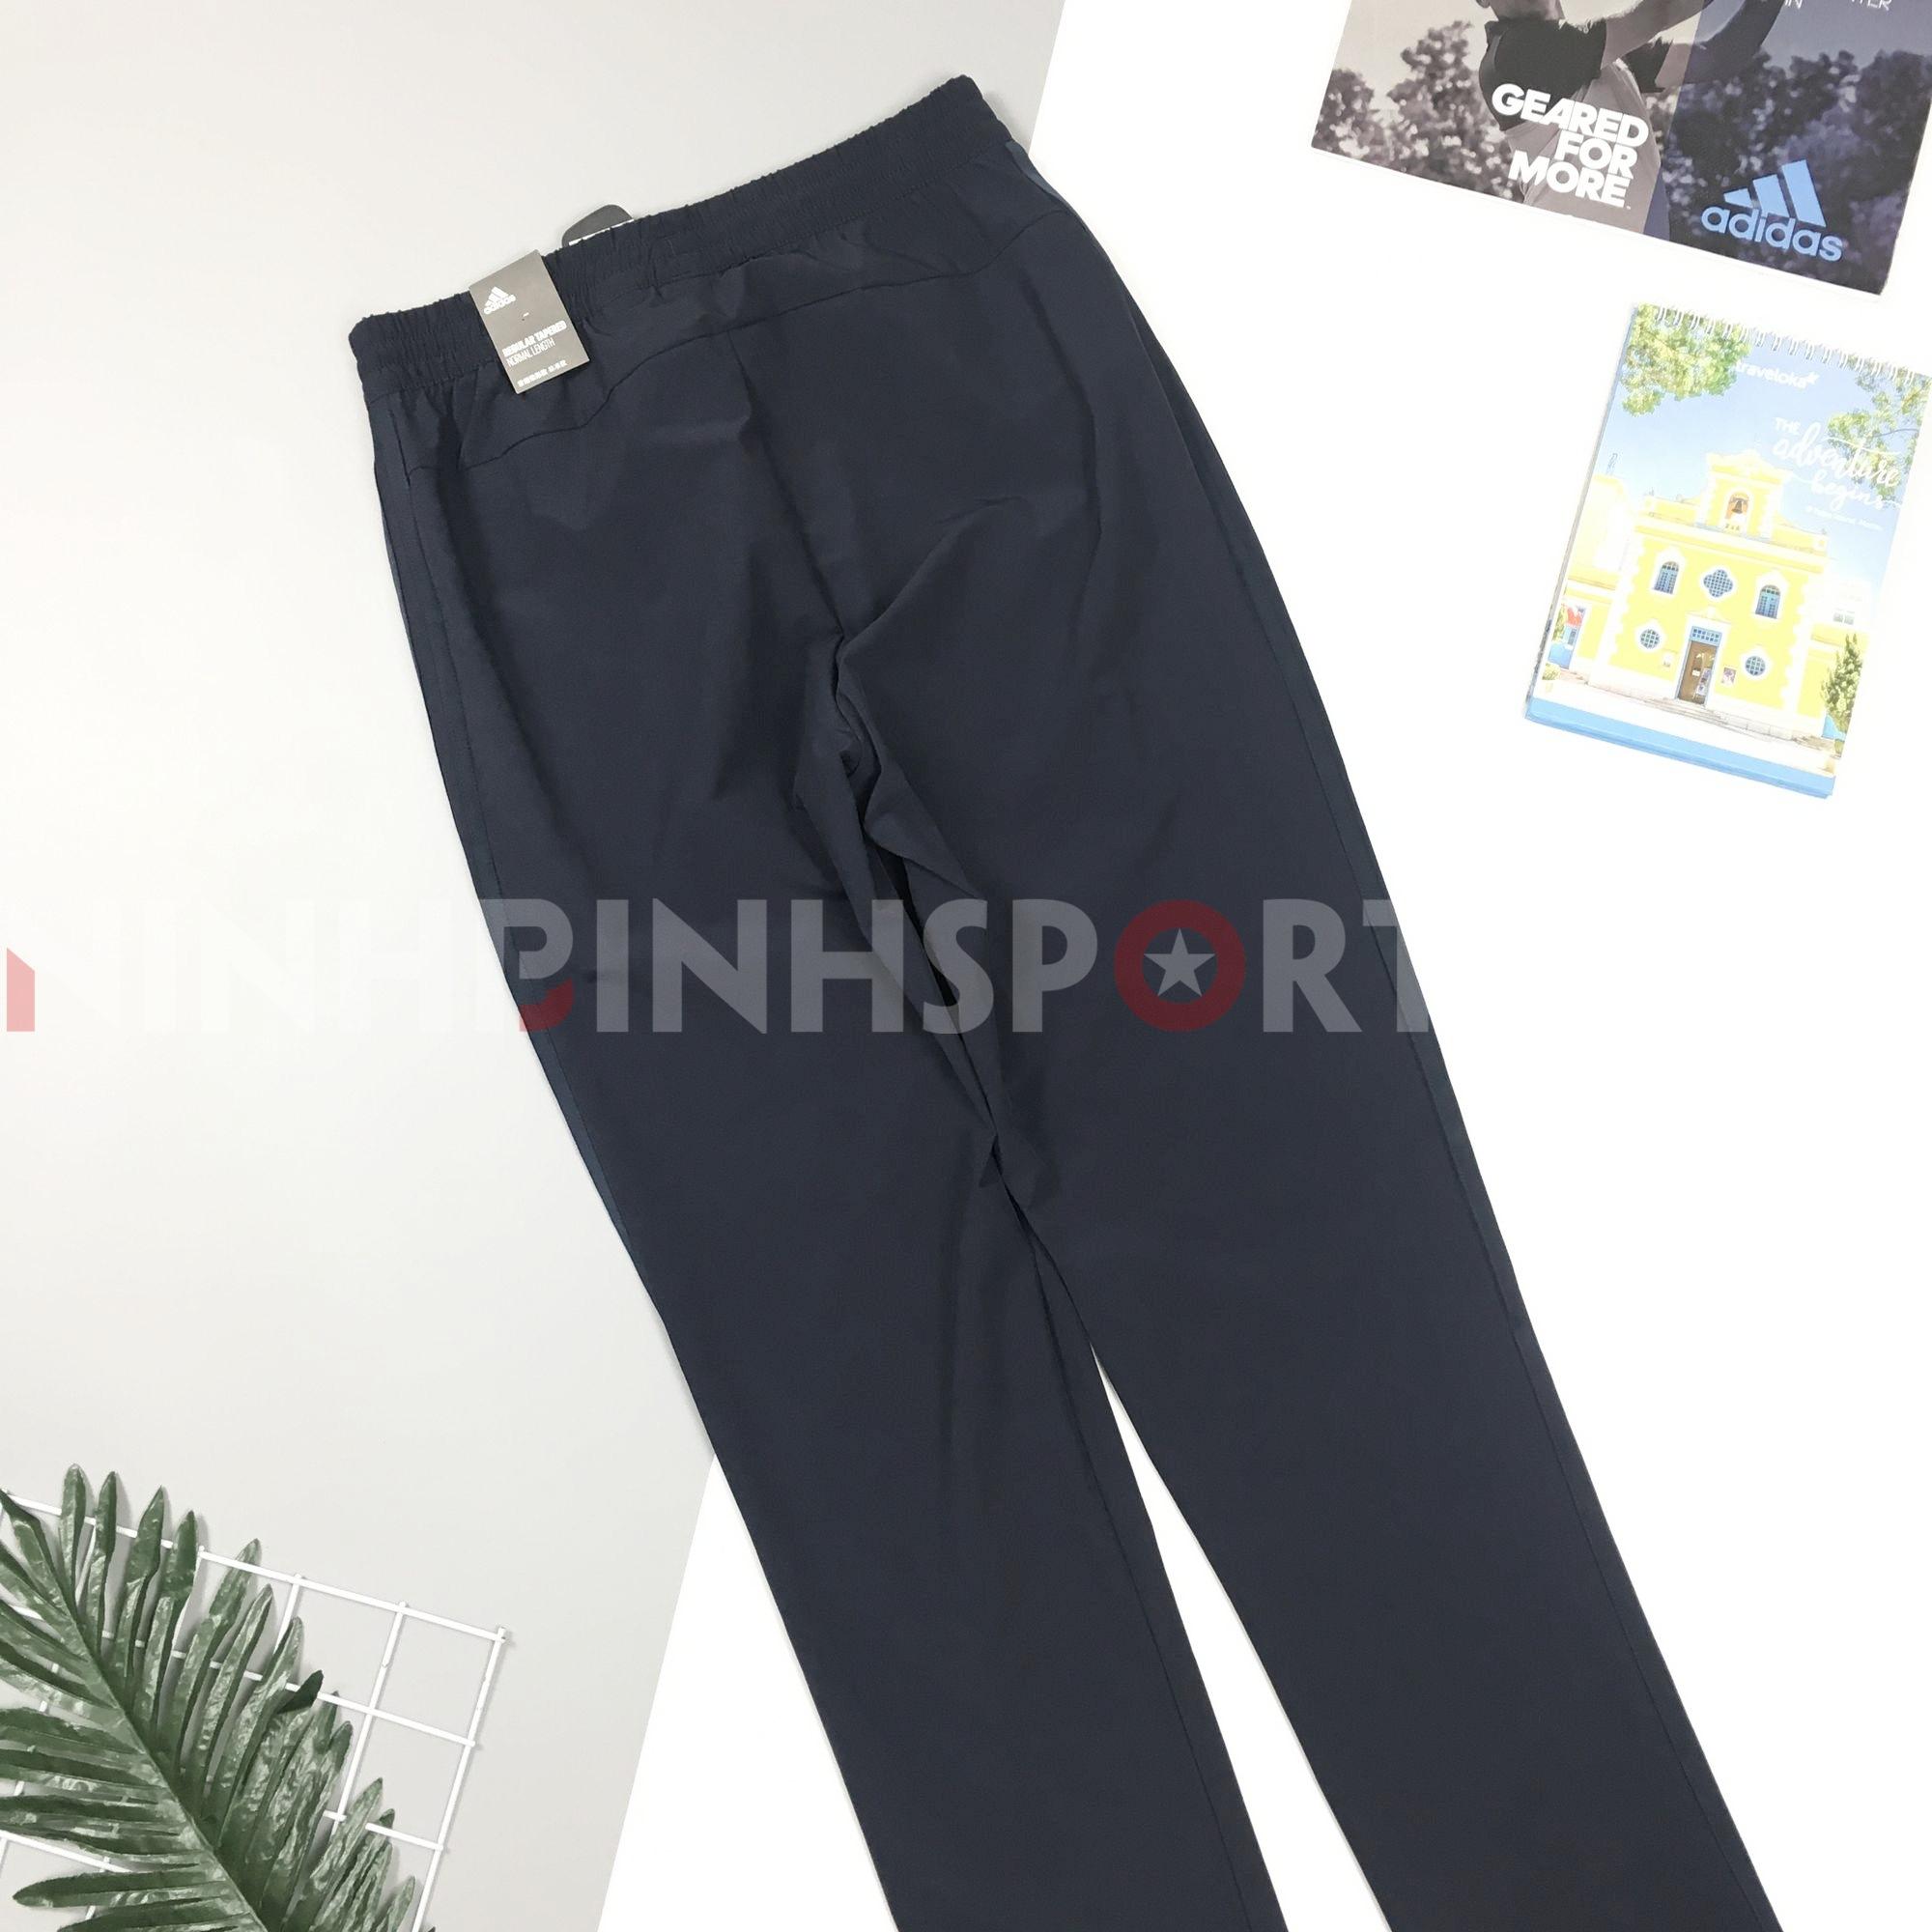 Quần dài thể thao nam Adidas Pant Woven - DW4650